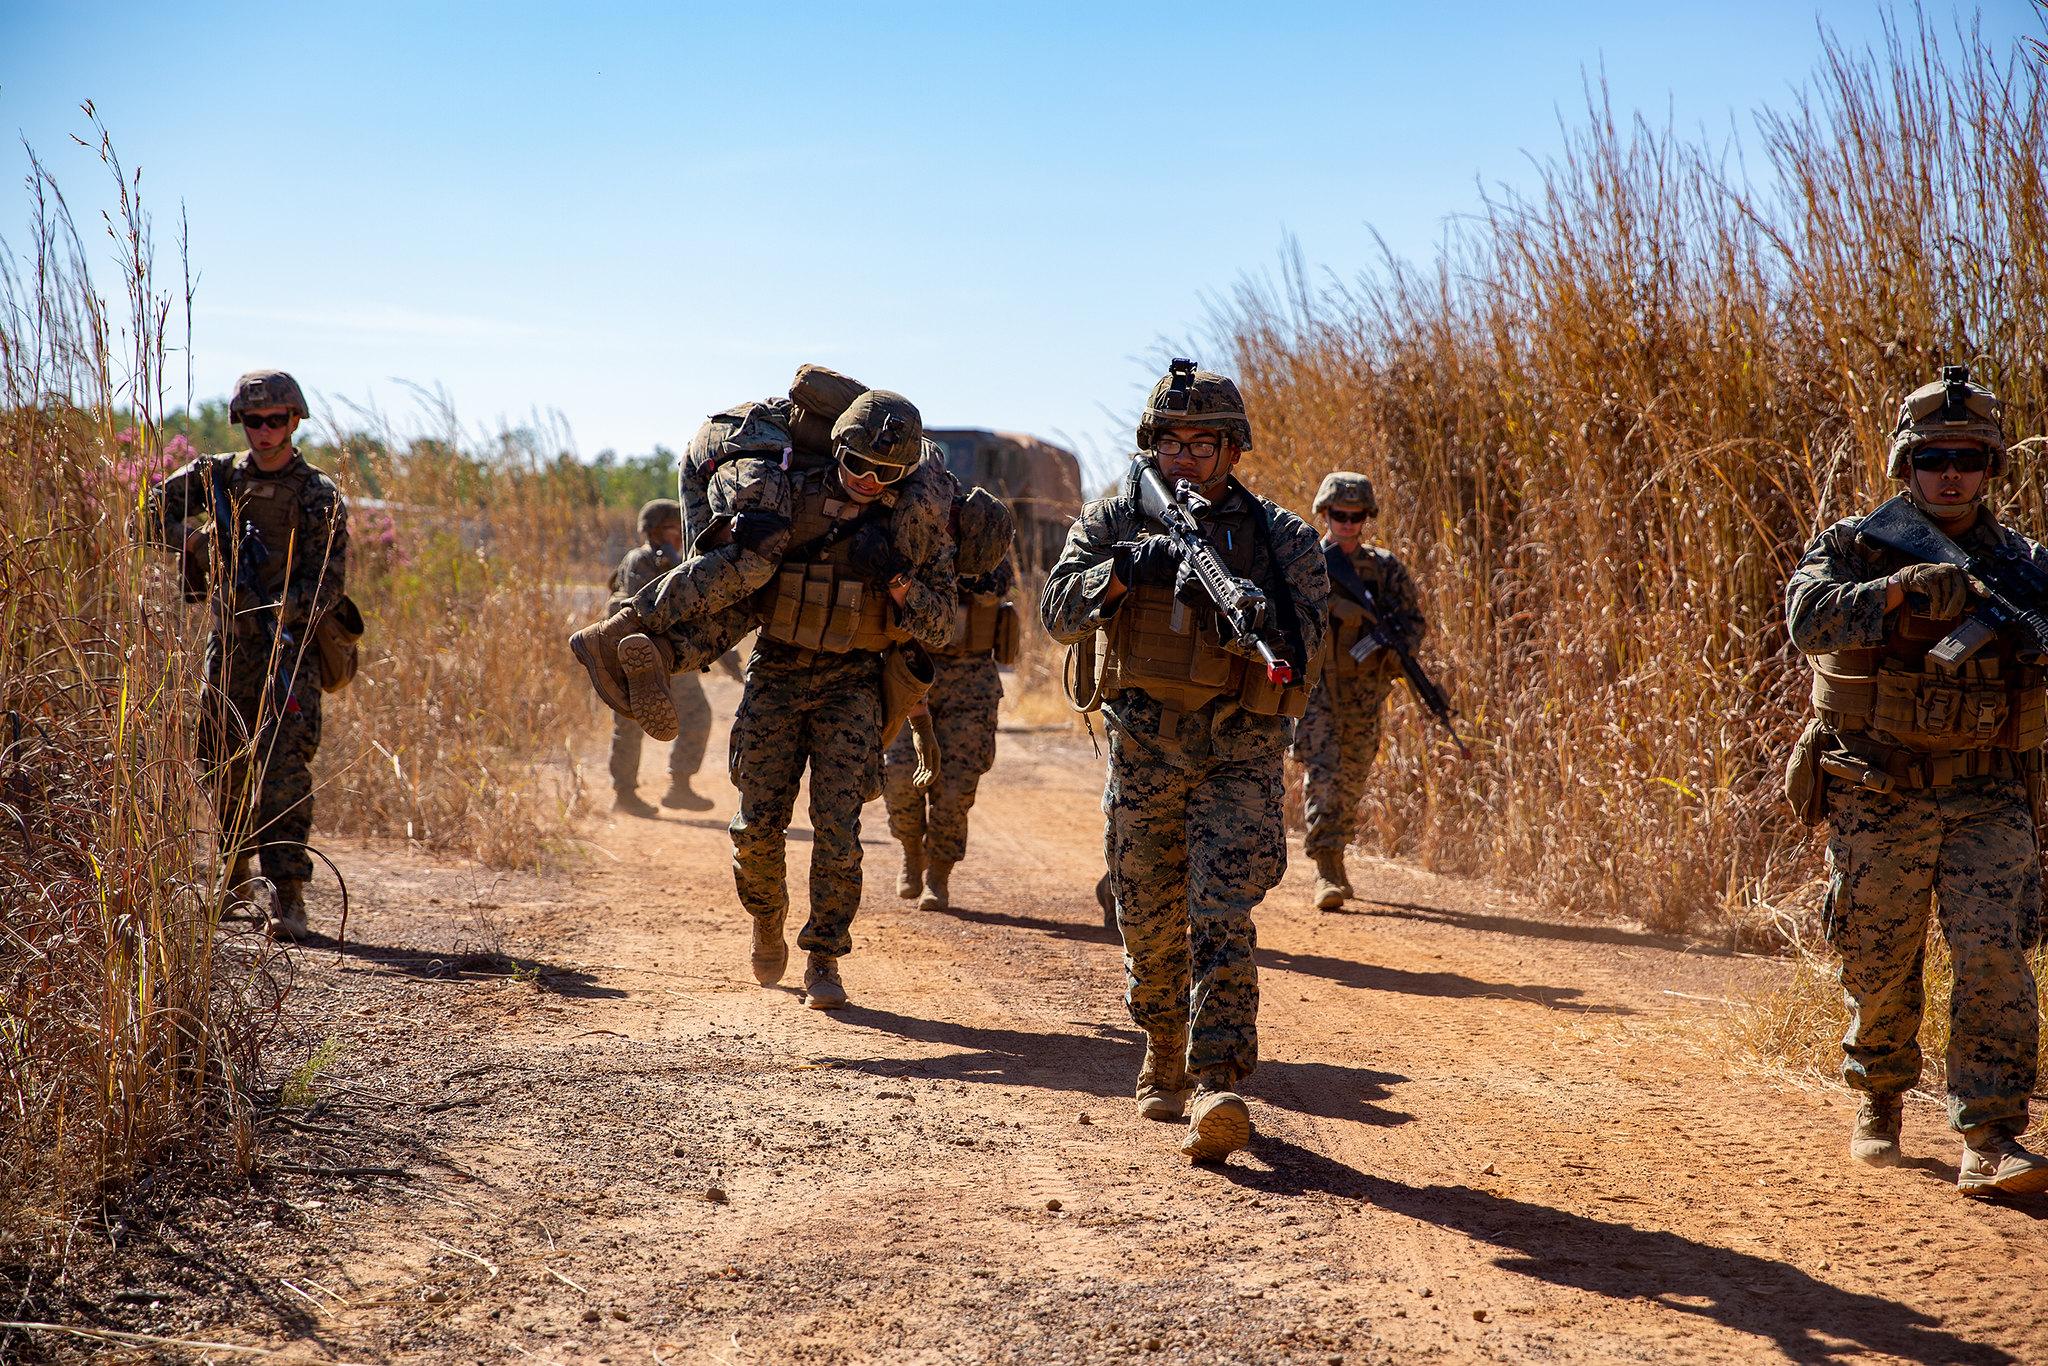 U.S. Marines with Logistics Combat Element, Marine Rotational Force - Darwin, conduct patrol and ambush exercises at Robertson Barracks, NT, Australia, July 14, 2020. (Lance Cpl. Natalie Greenwood/Marine Corps)